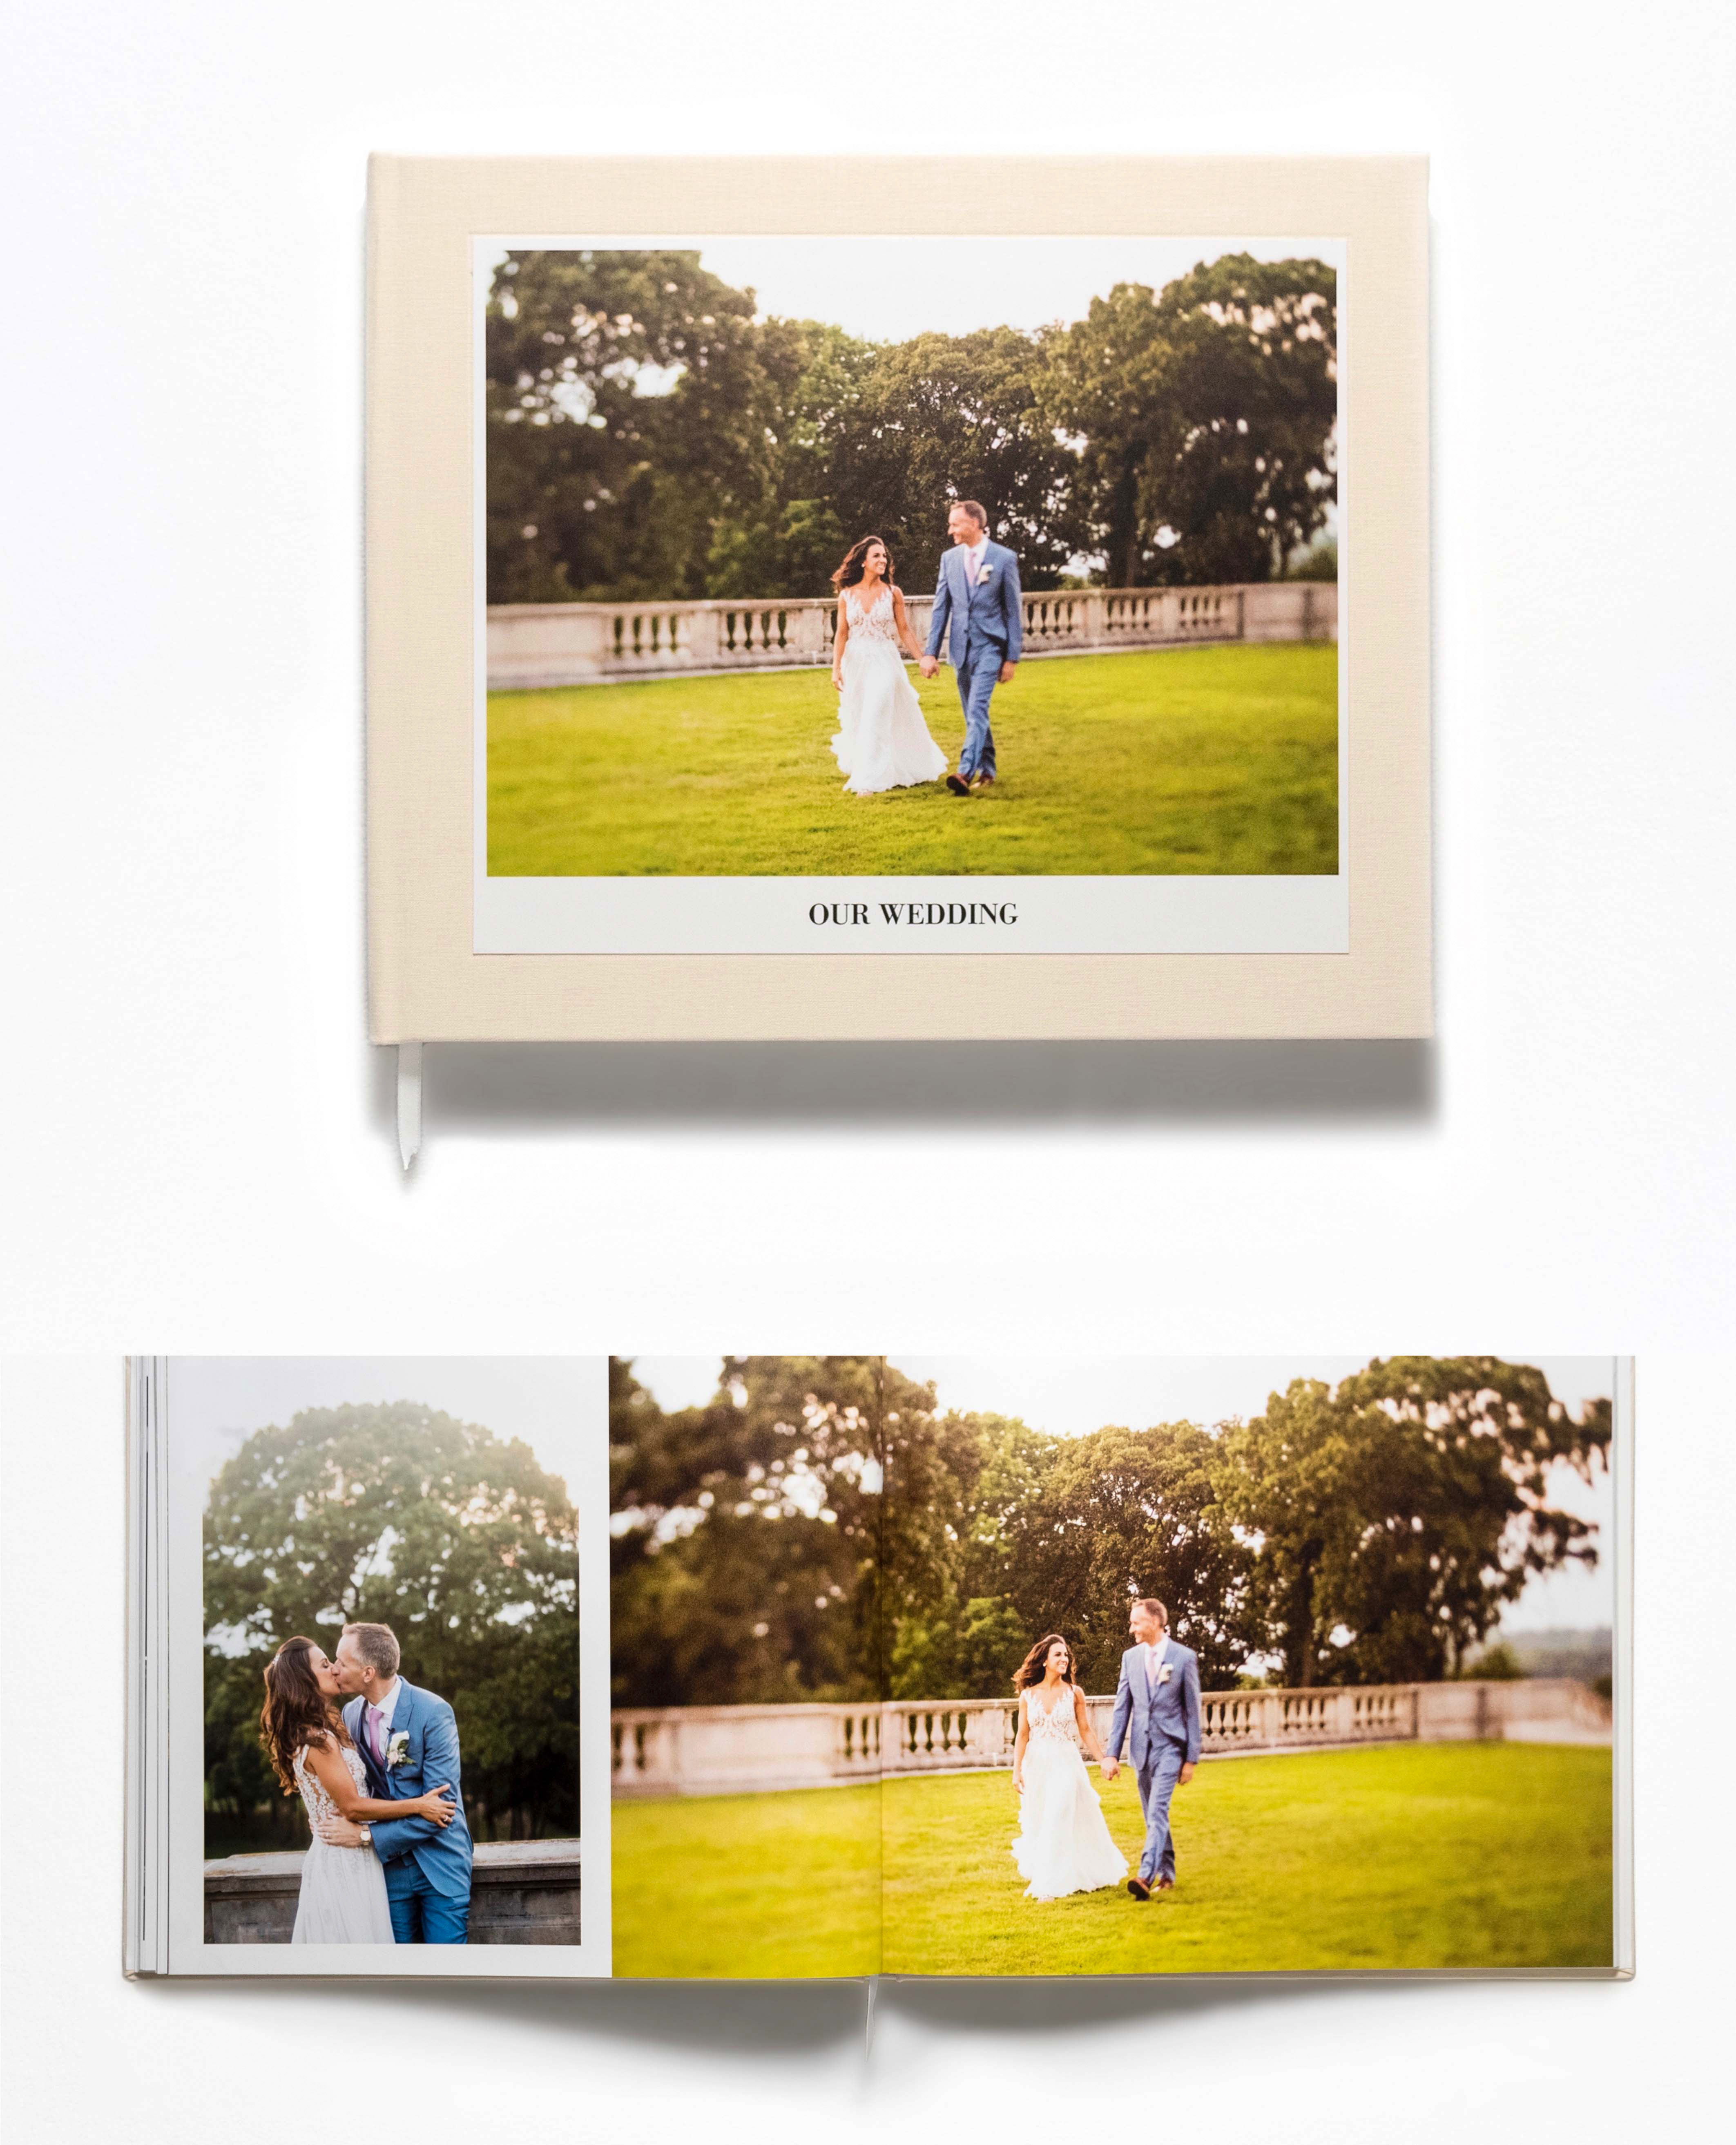 wedding photo albums hardback cover open book below